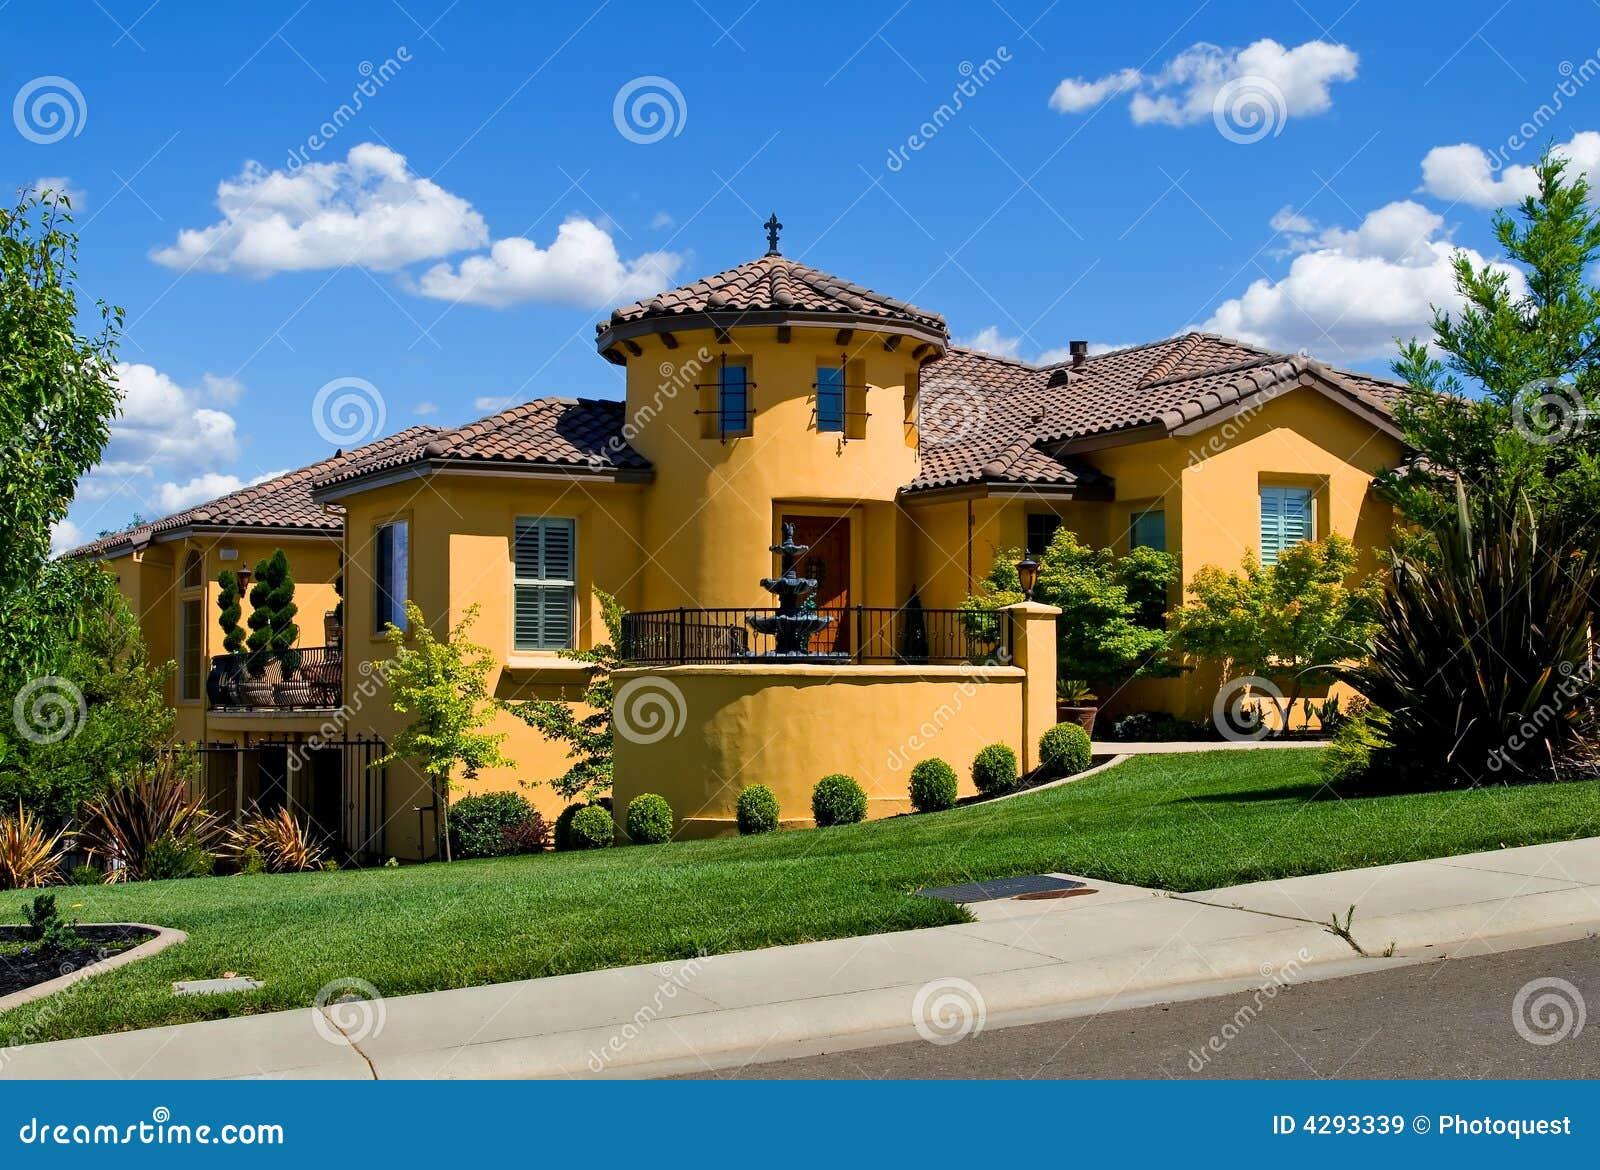 Casa de campo amarela bonita imagens de stock royalty free - Fotos de casas de campo ...